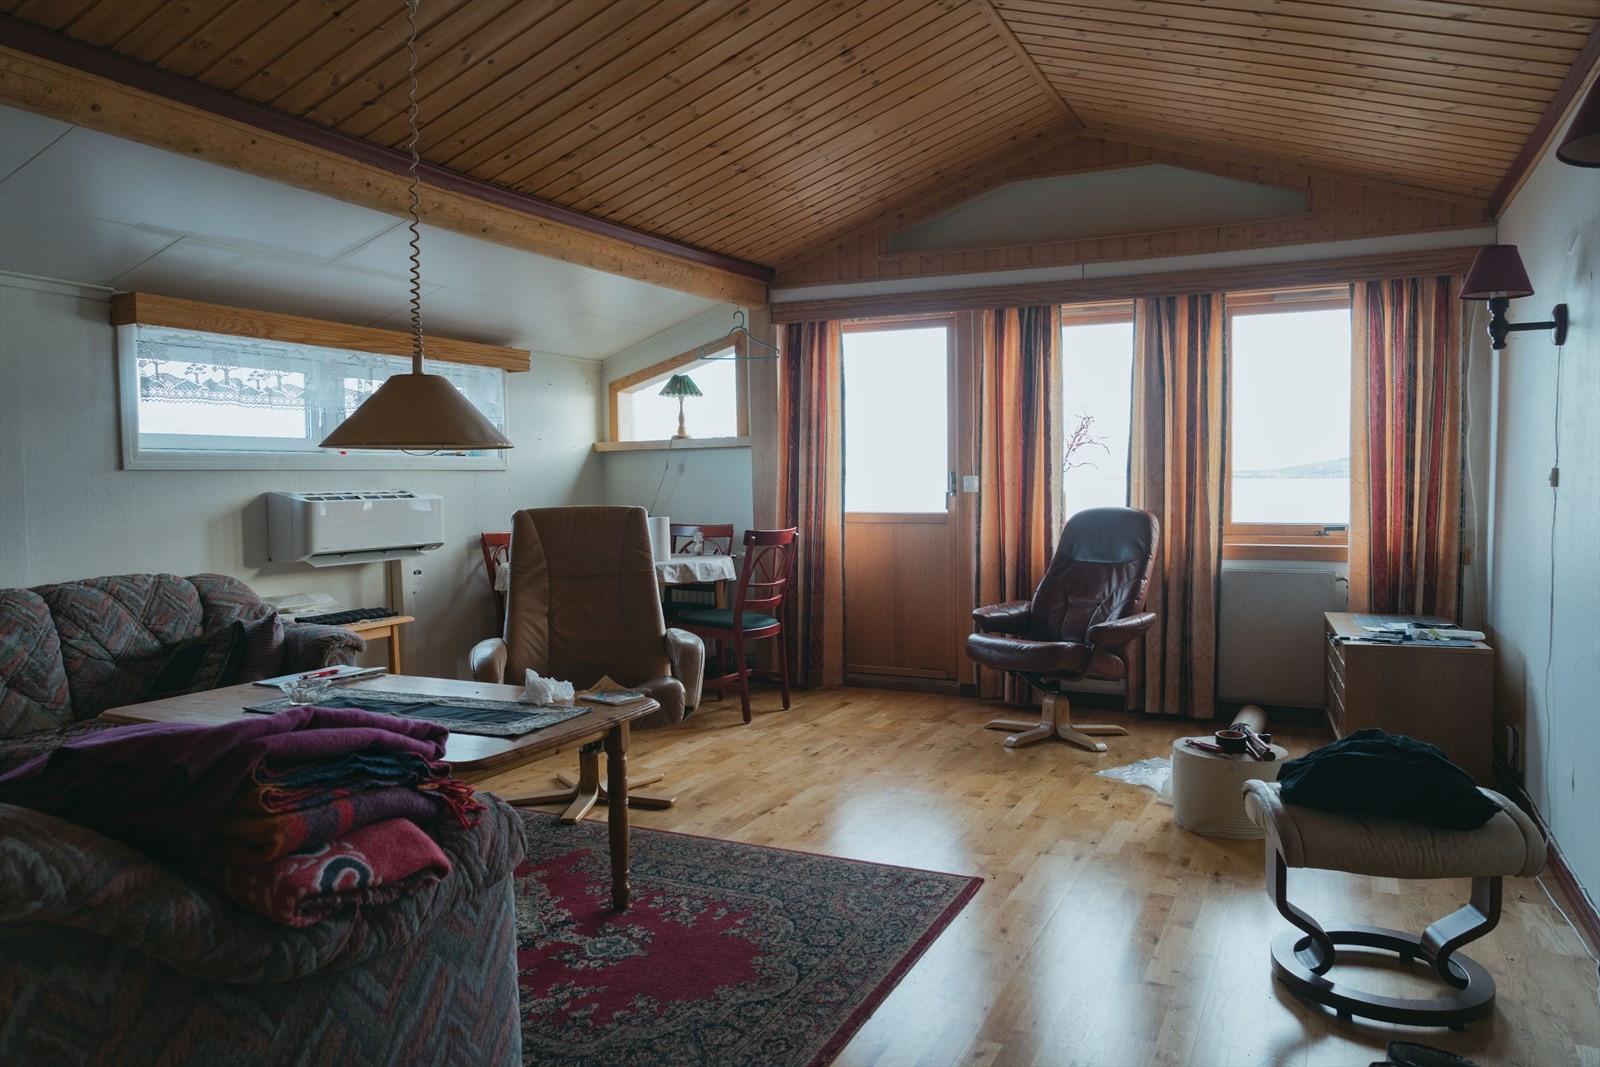 Stue i boligdelen